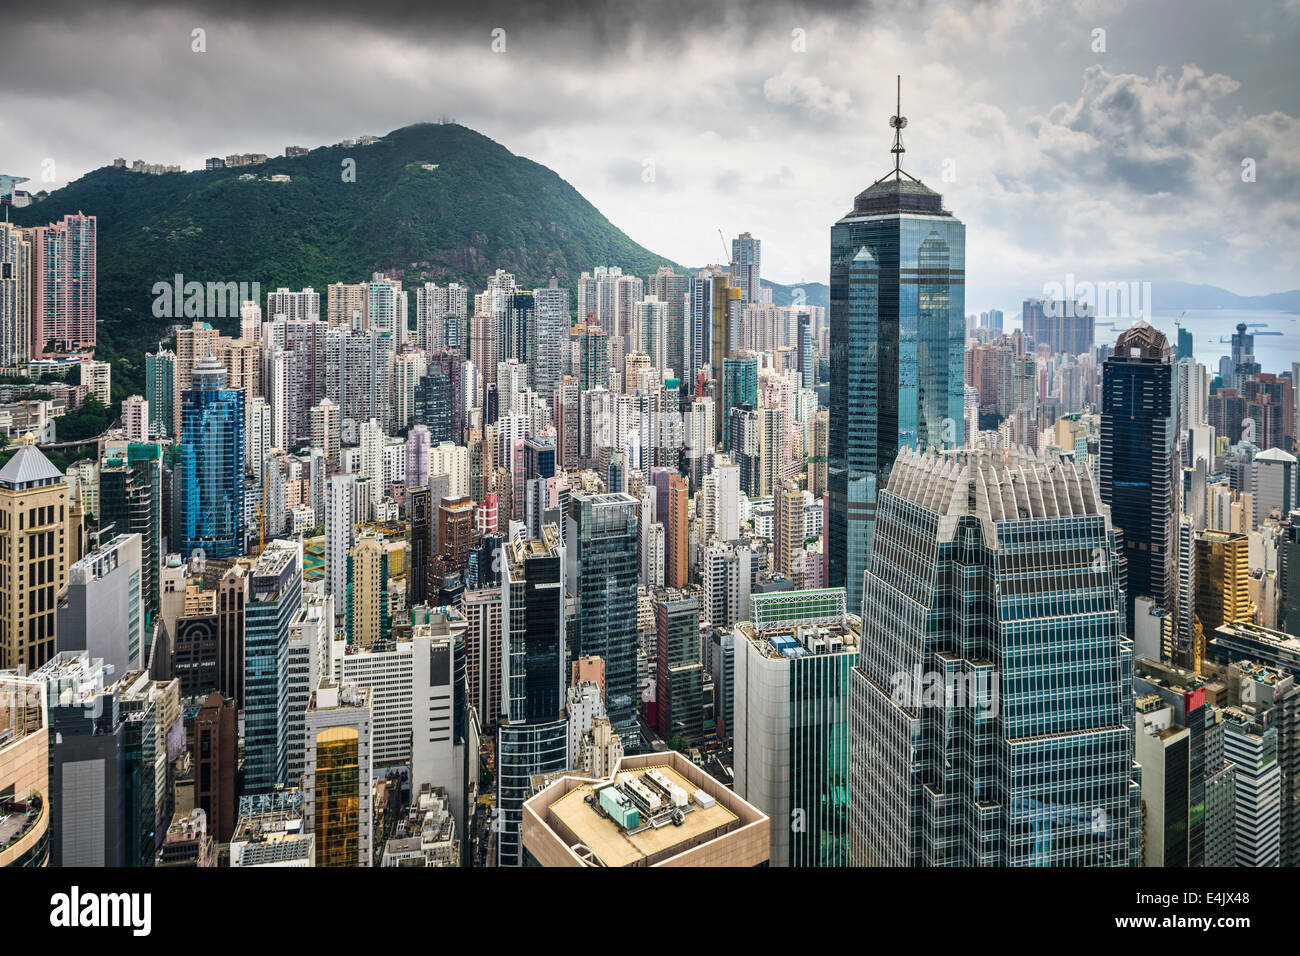 Hong Kong, China Luftaufnahme des Stadtbildes im Victoria Harbour. Stockbild